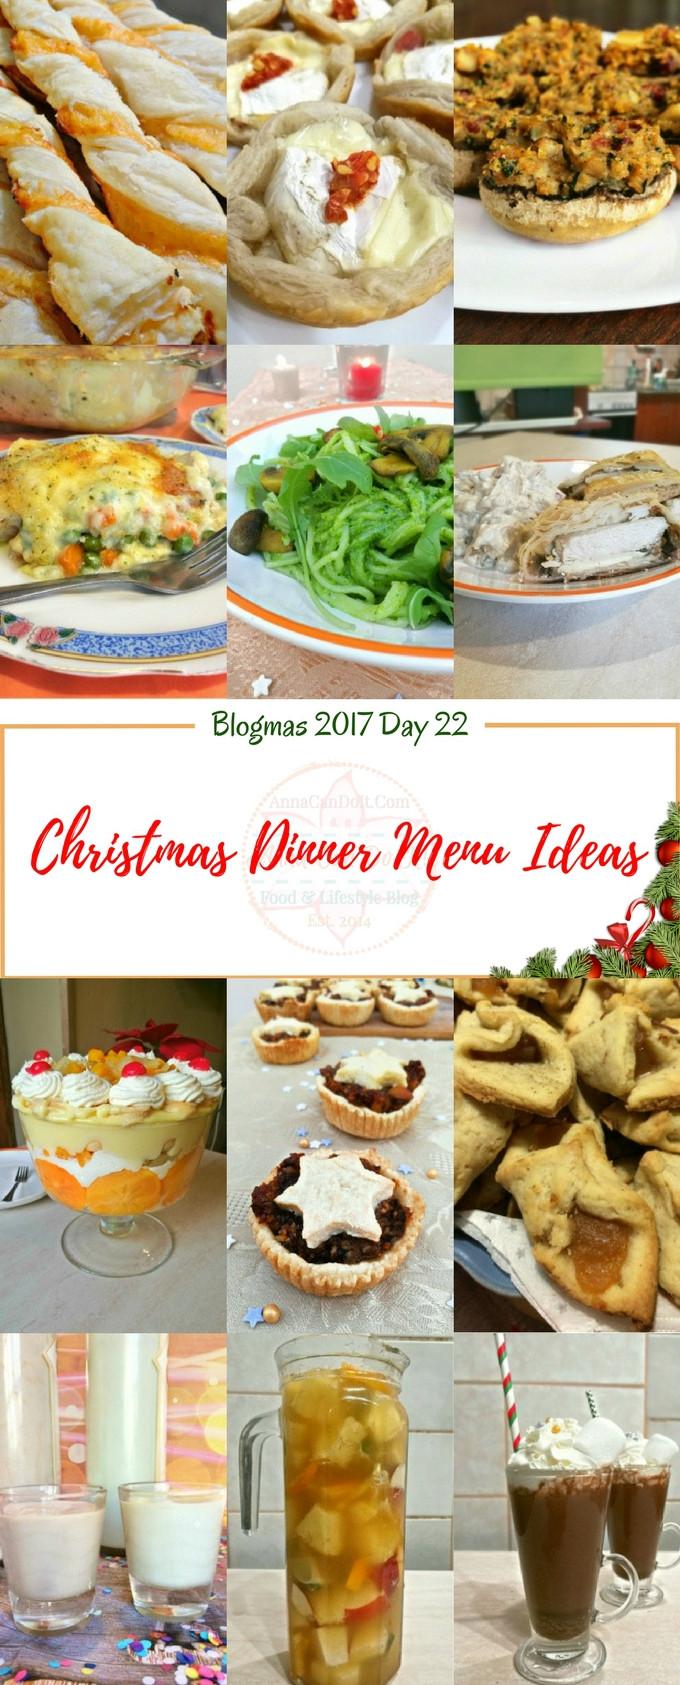 Christmas Dinner Ideas 2017  Christmas Dinner Menu Ideas Blogmas 2017 Day 22